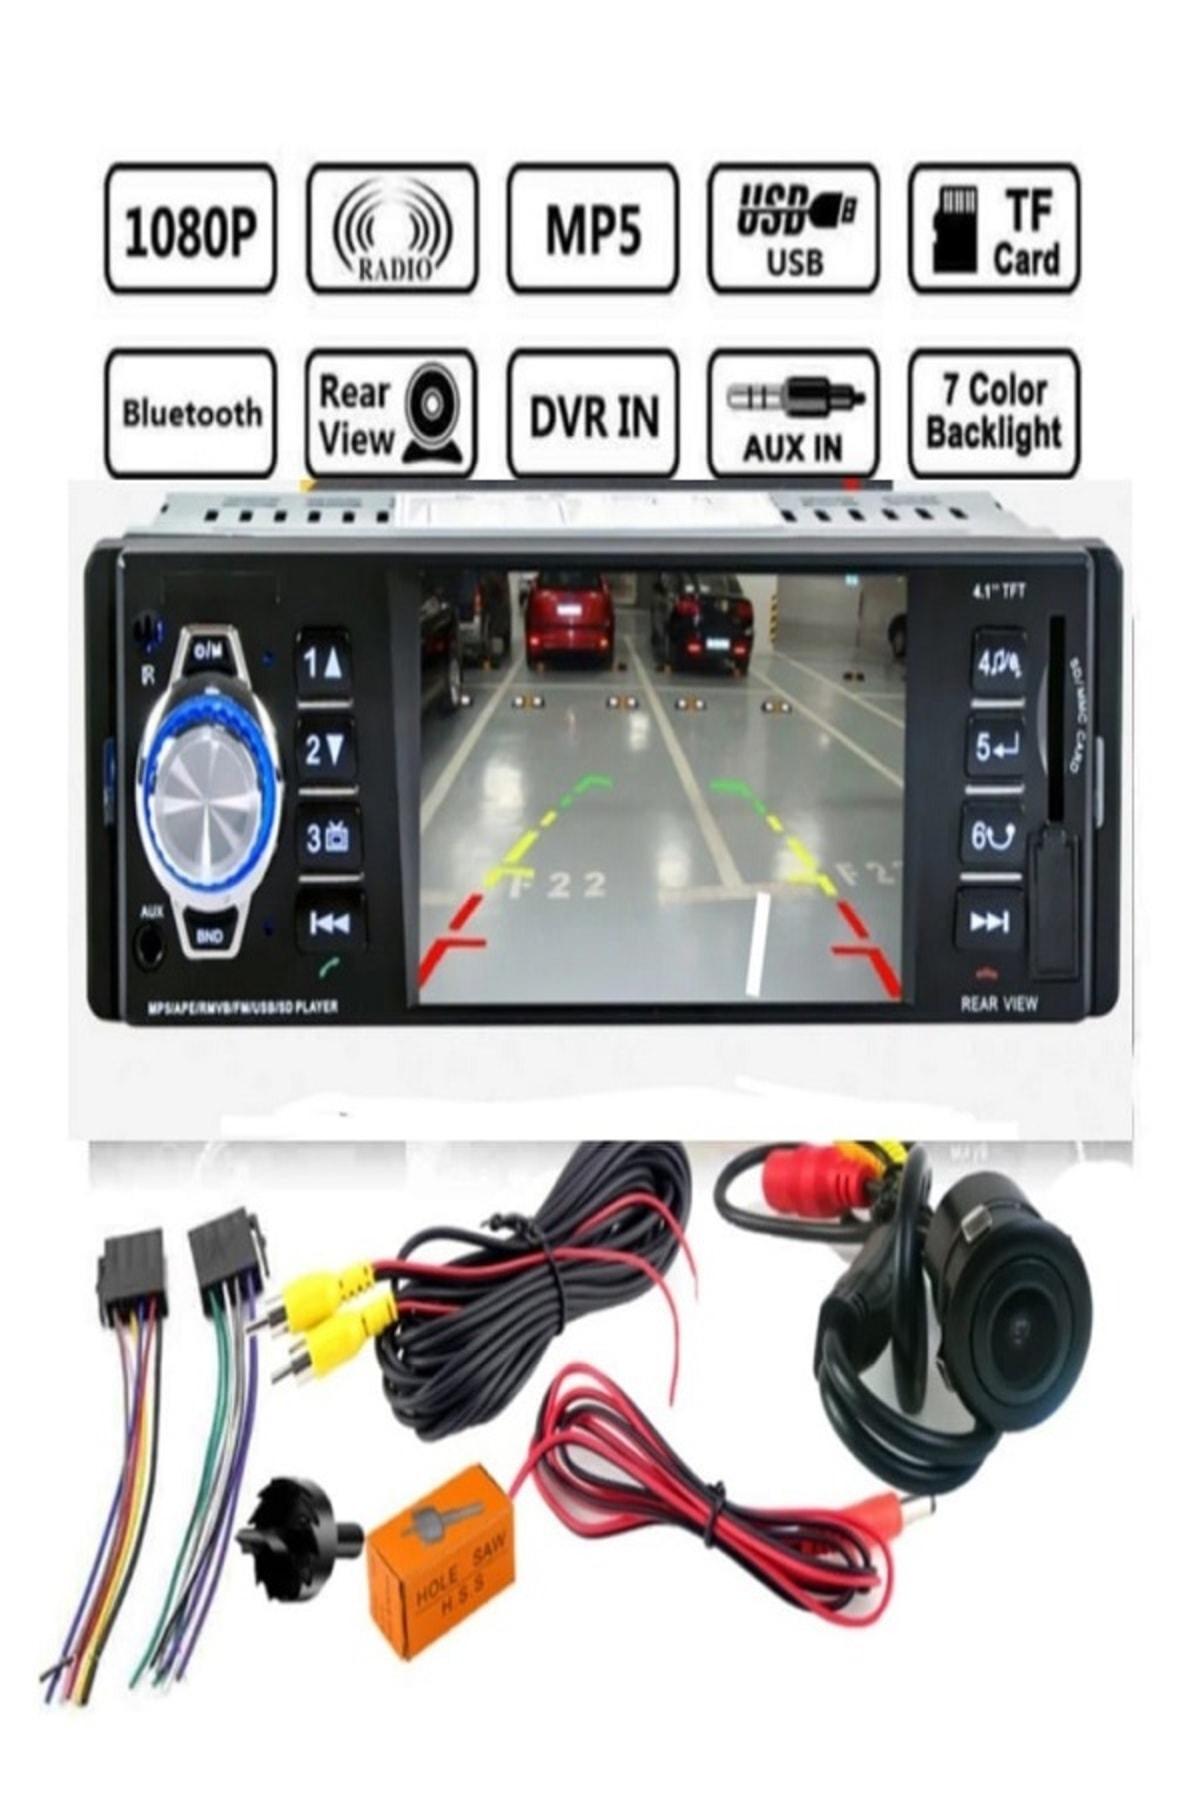 Ds-422 Araba Oto Teyp+geri Park Kamera-bluetooth-mp5-mp3-usb